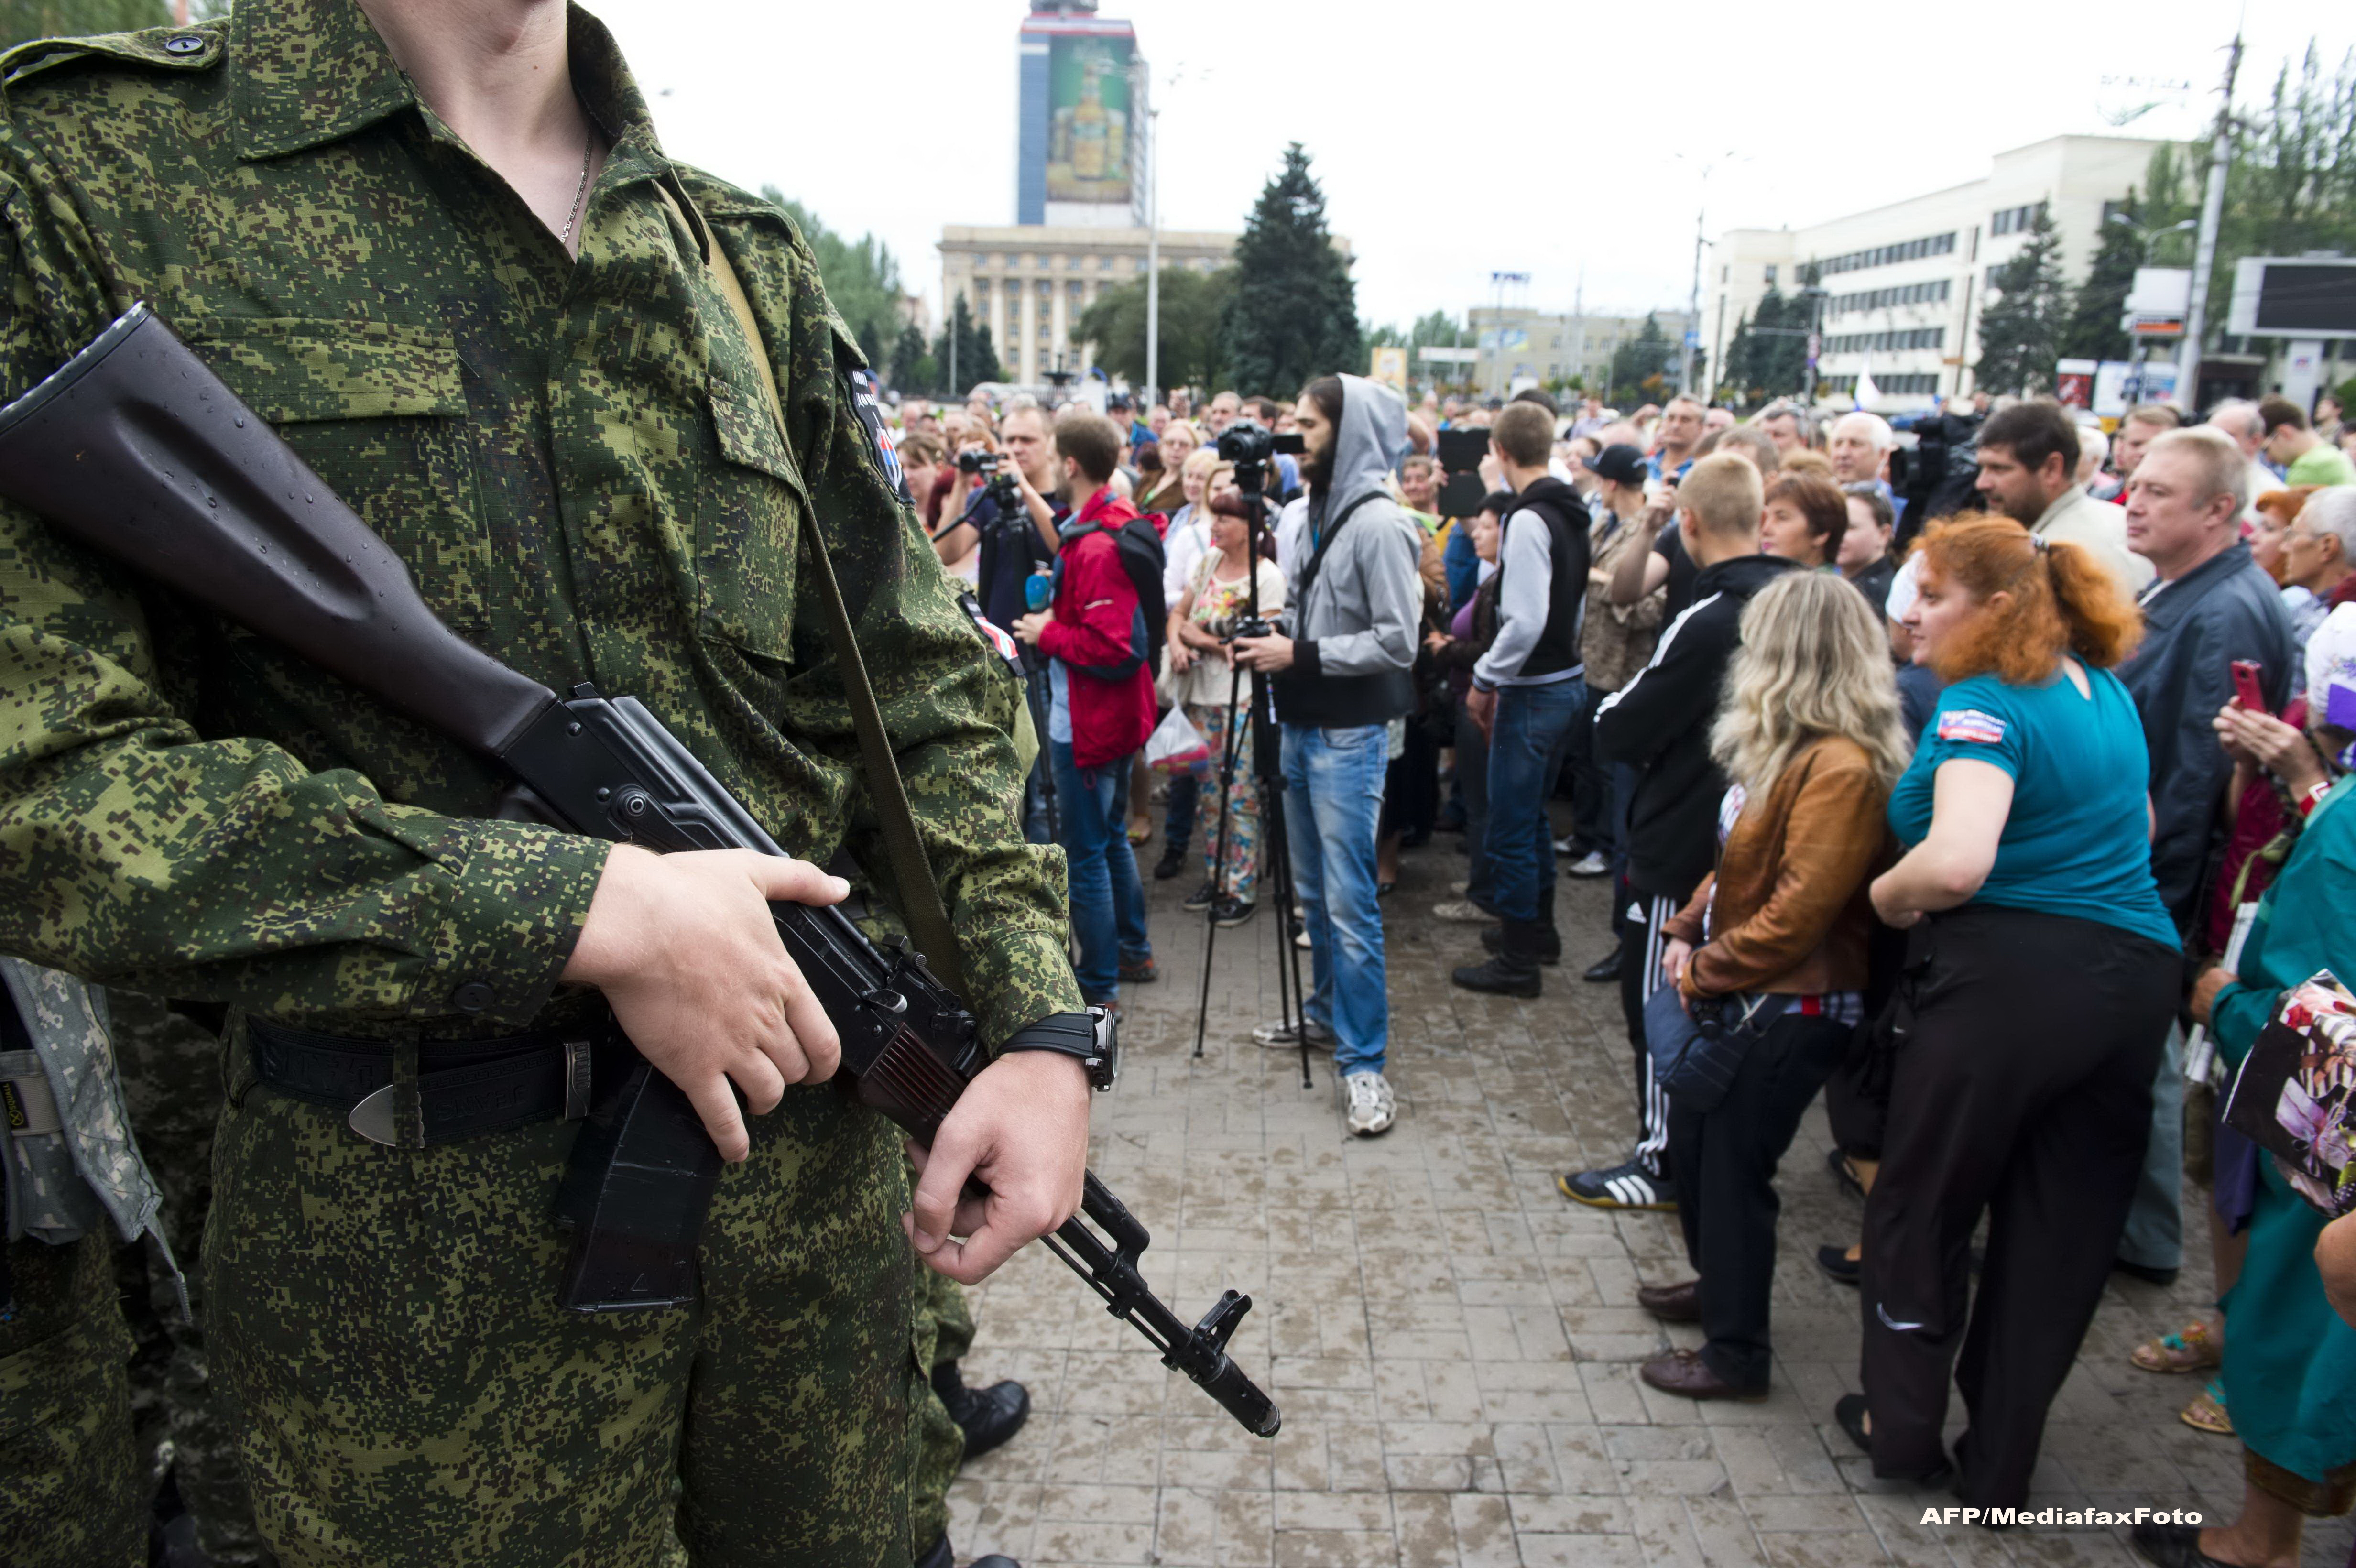 Criza in Ucraina. Scoala din Donetk si maxi-taxi, atacate cu obuze in prima zi de cursuri. Zece morti si noua raniti